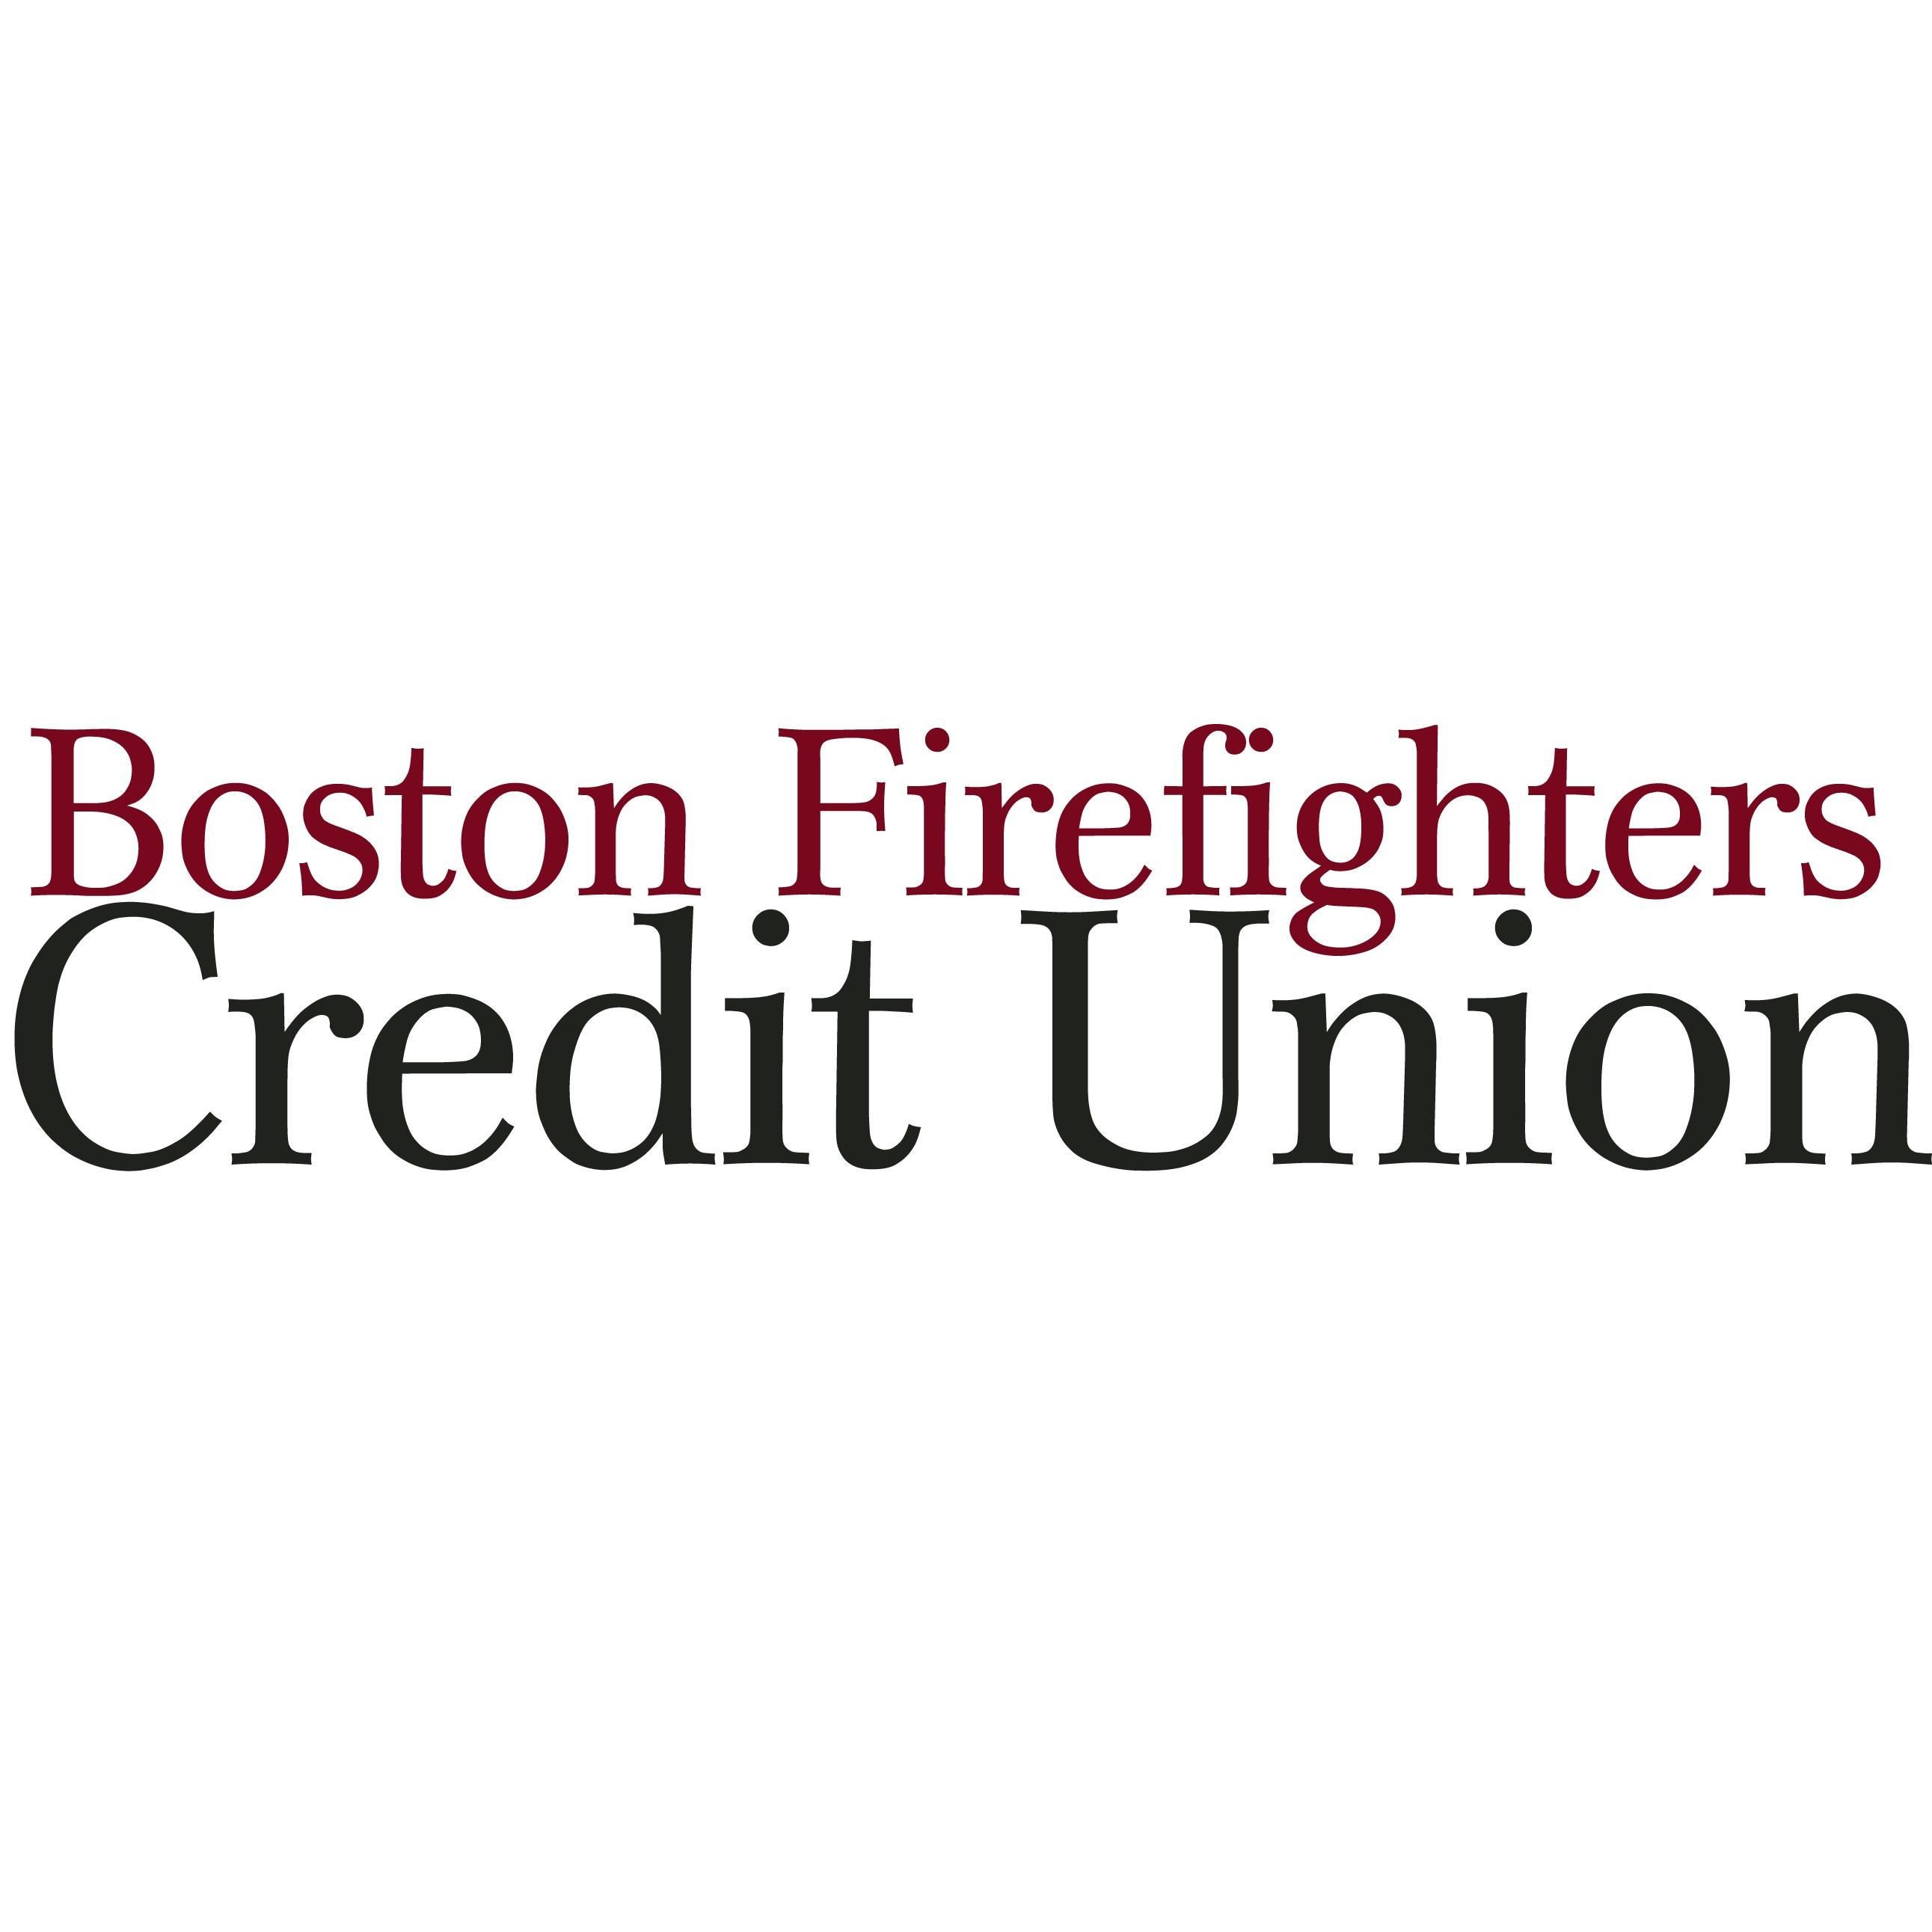 Boston Firefighters Credit Union